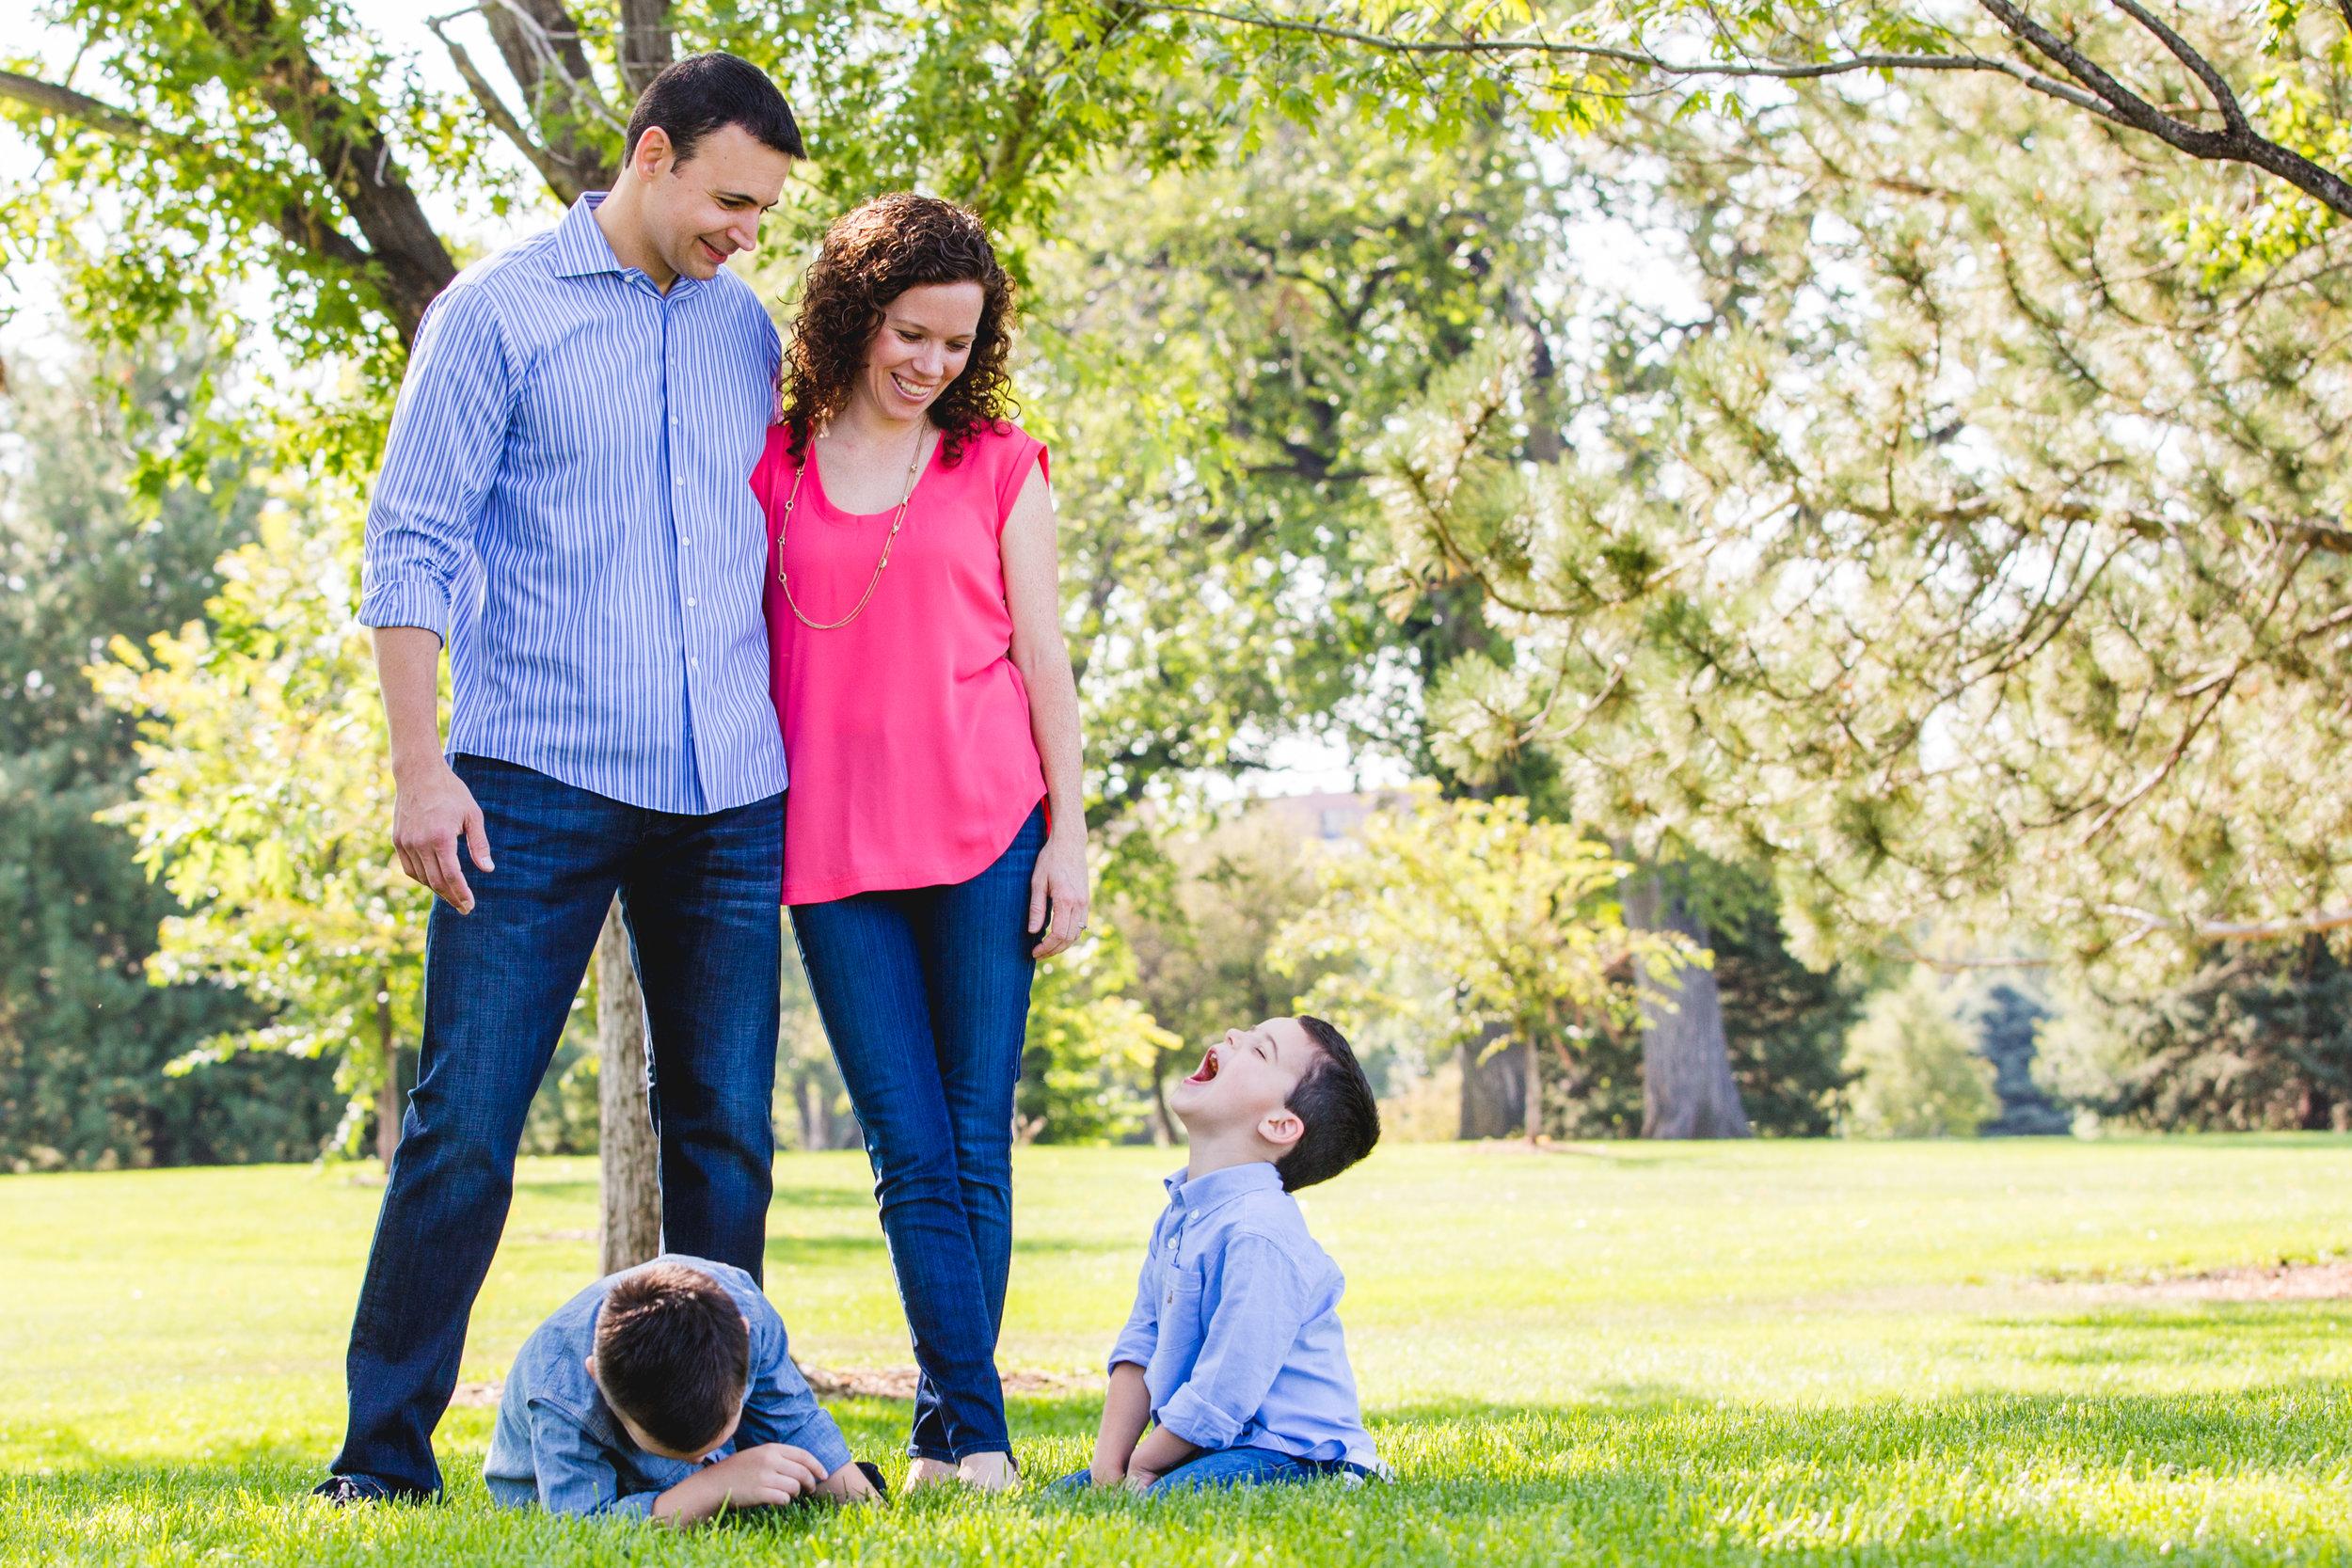 Lkalowych Family_Think Darryl Photography_Denver Family Photographer-18.jpg